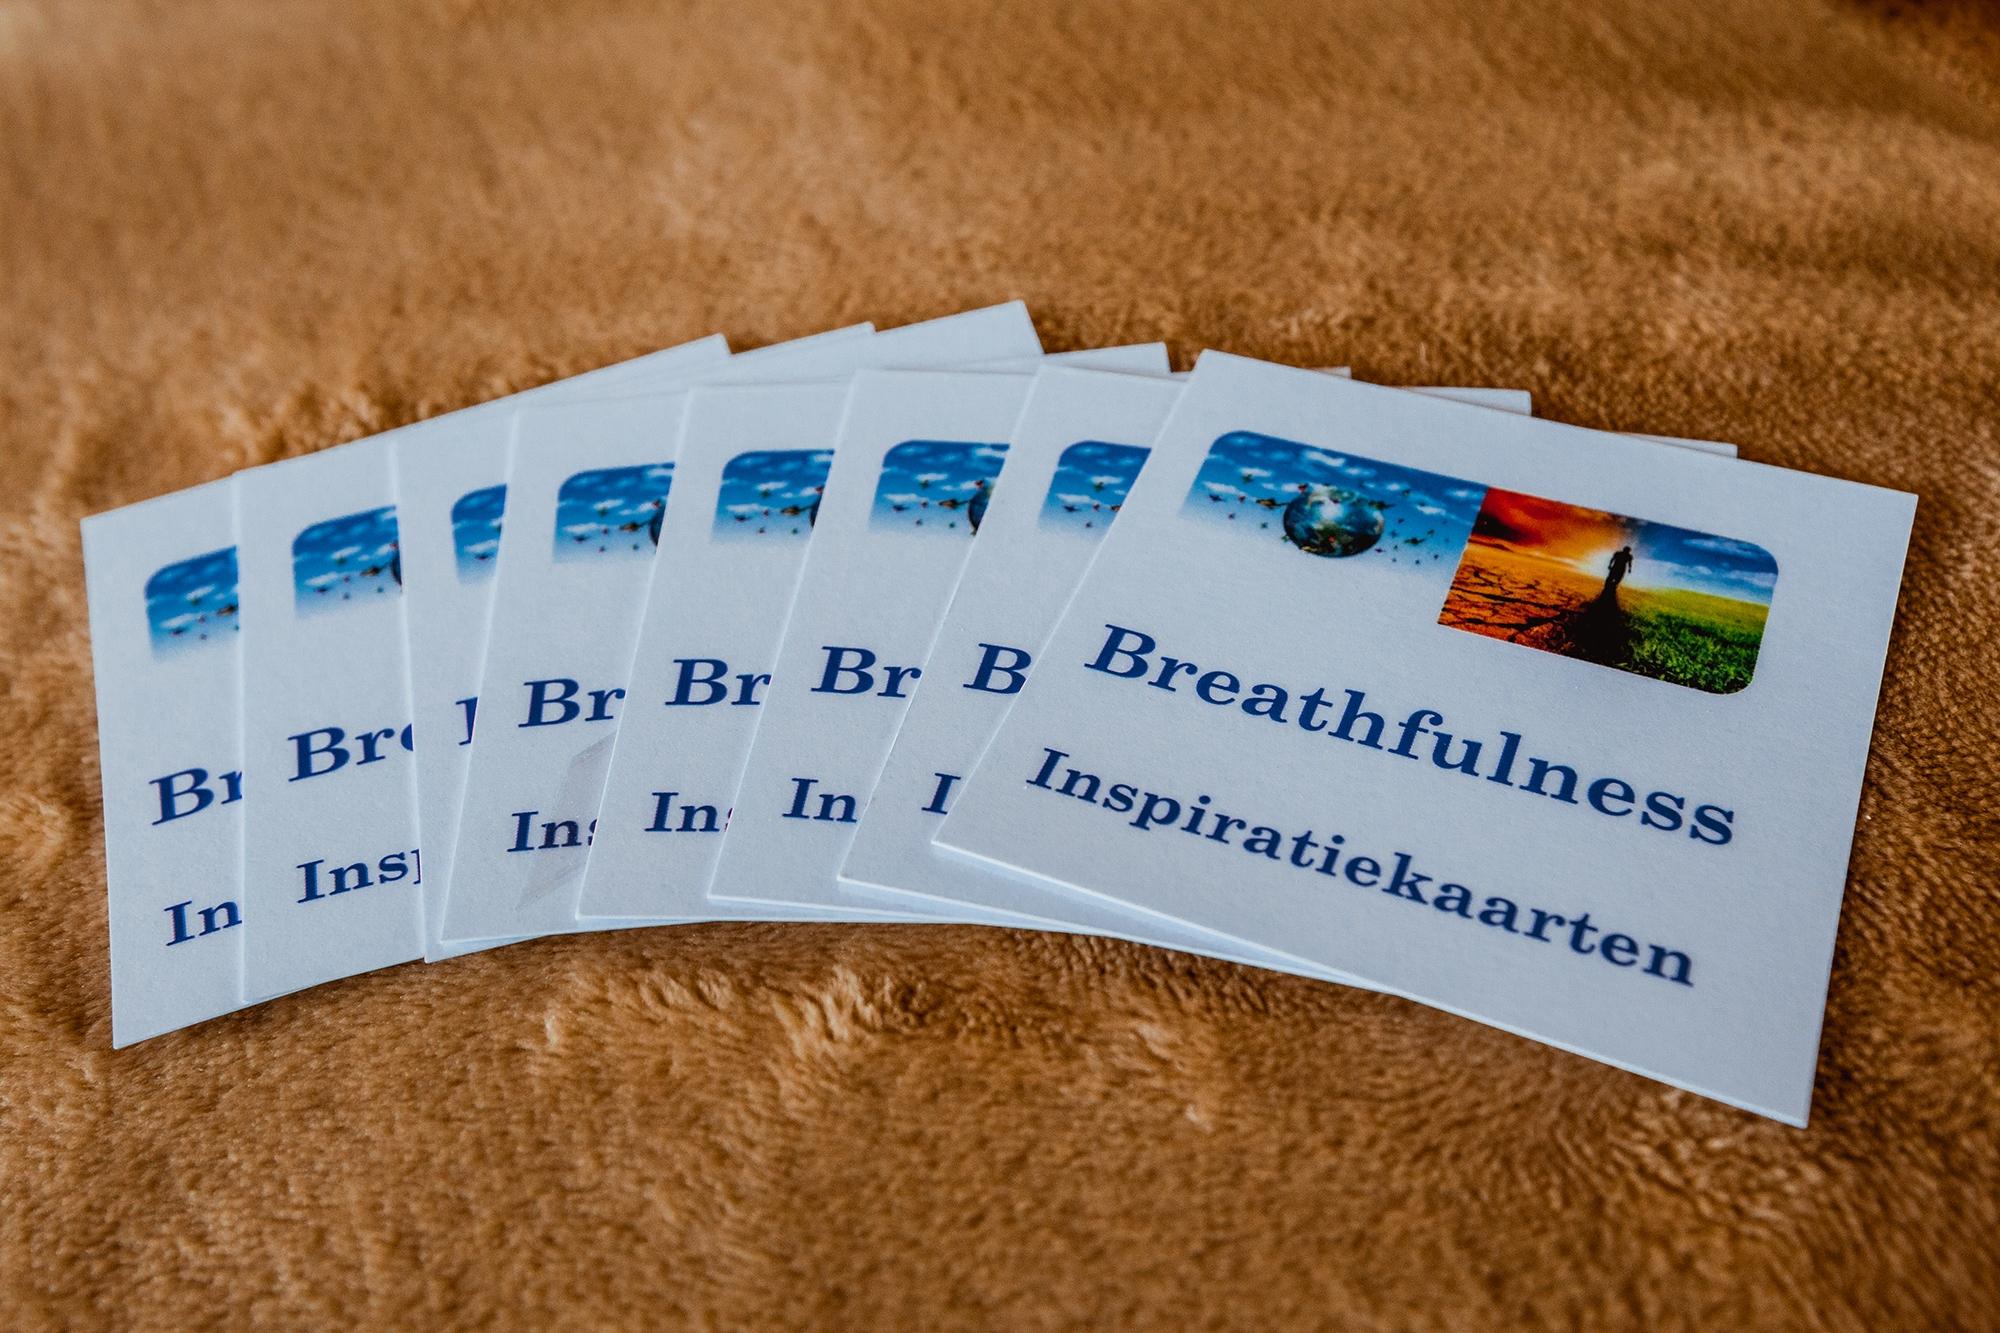 Breathfulness balans inspiratiekaarten